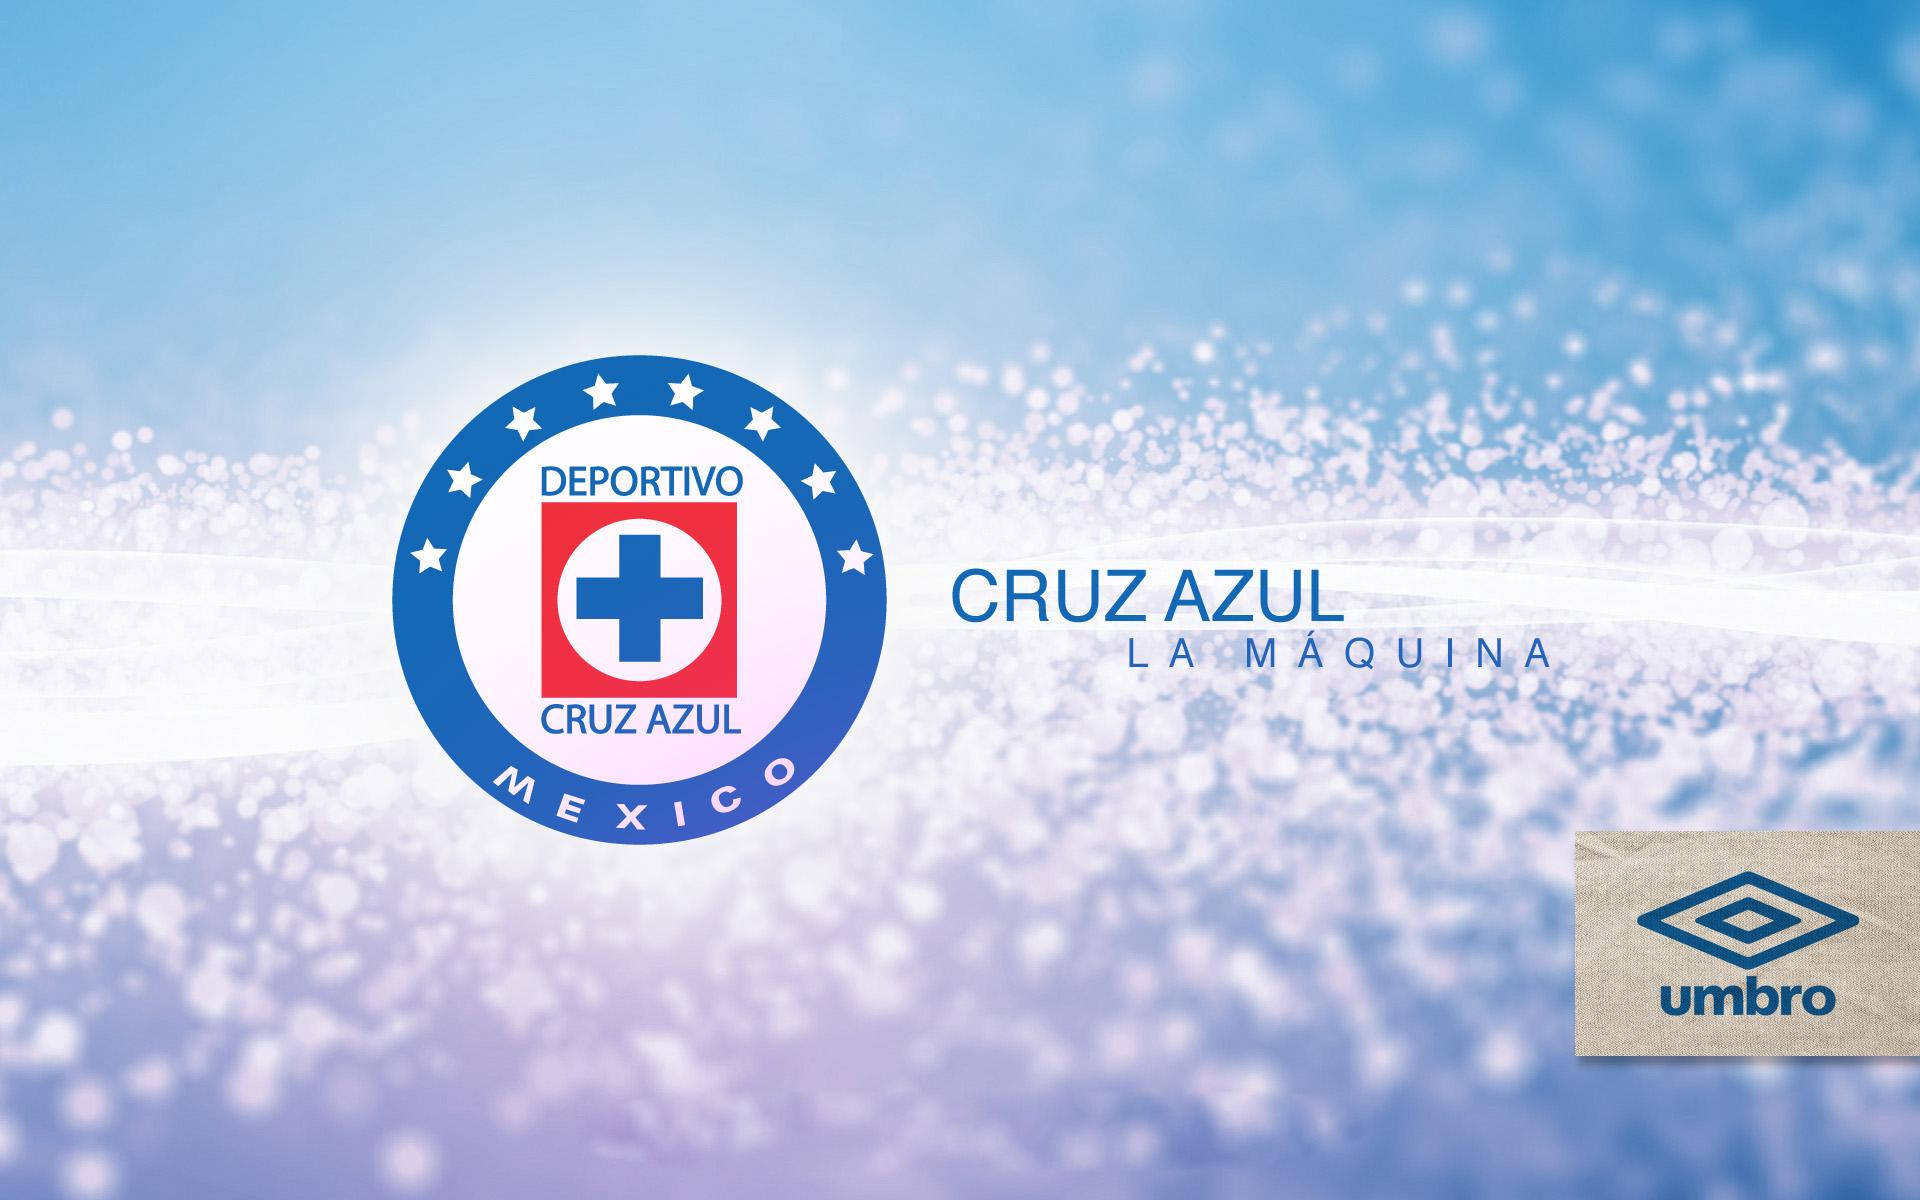 Inspirational Quotes Hd Wallpapers For Mobile Free Cruz Azul Backgrounds Pixelstalk Net